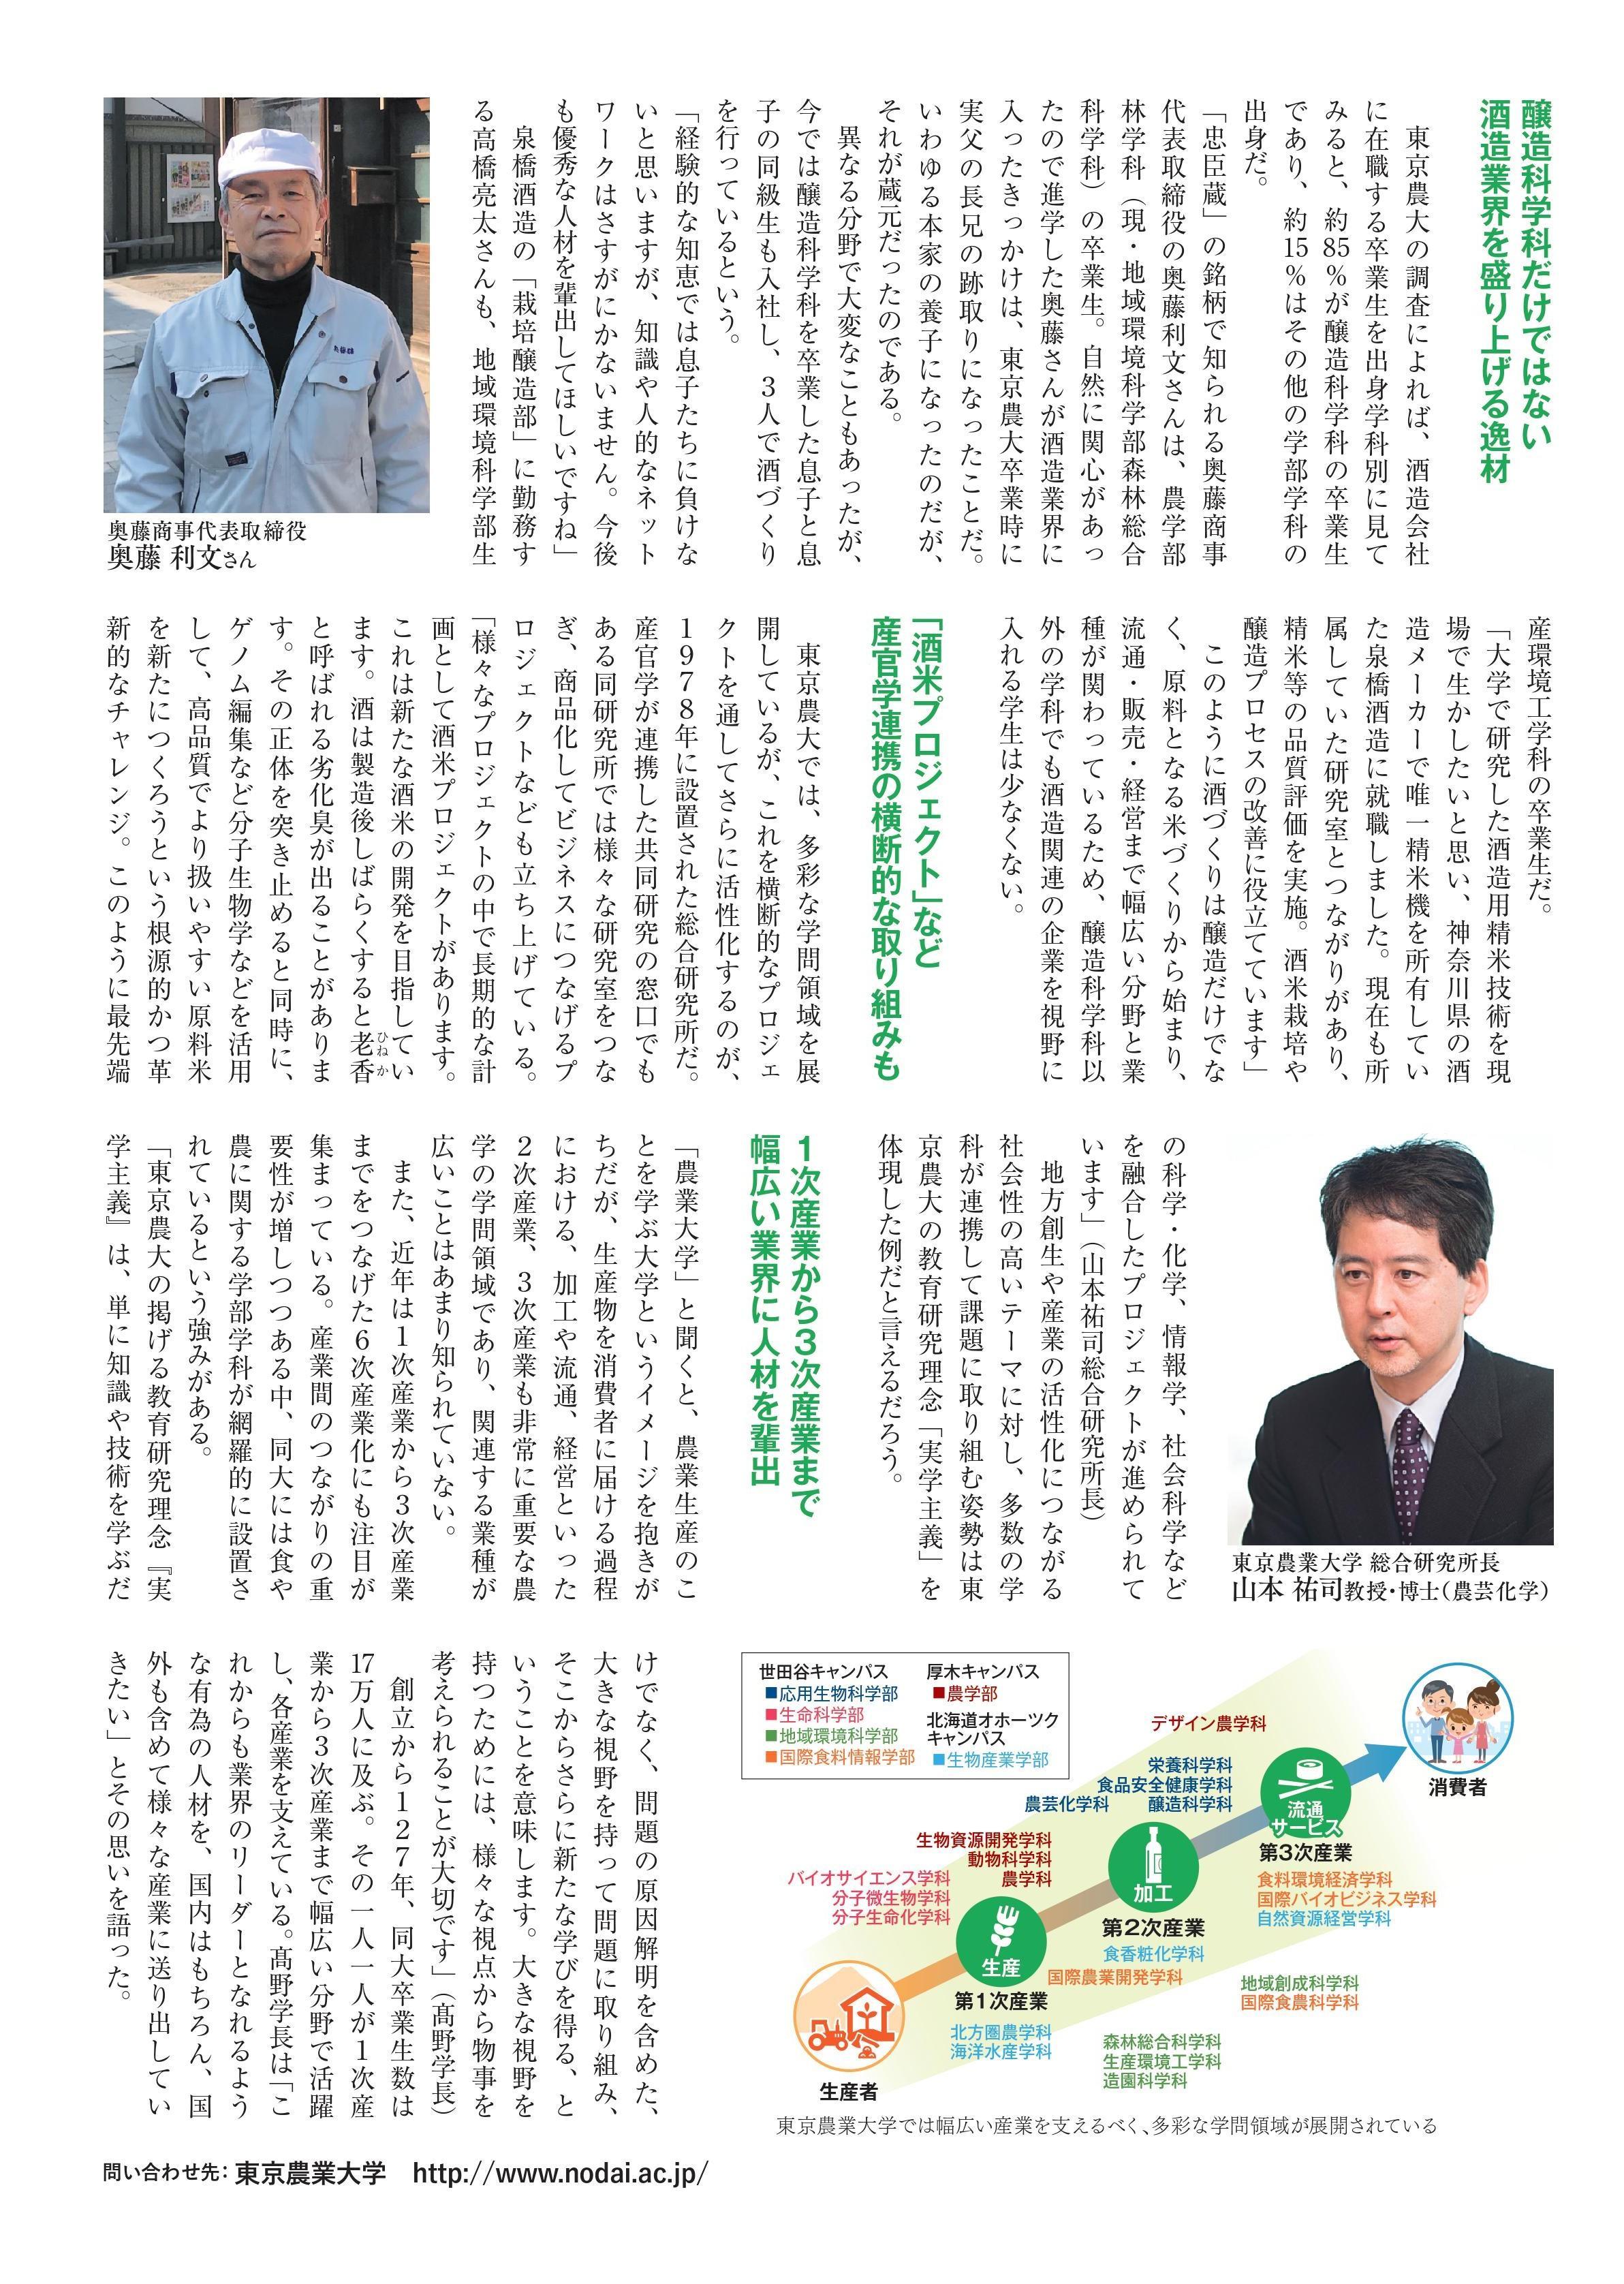 news-20180329-3.jpg